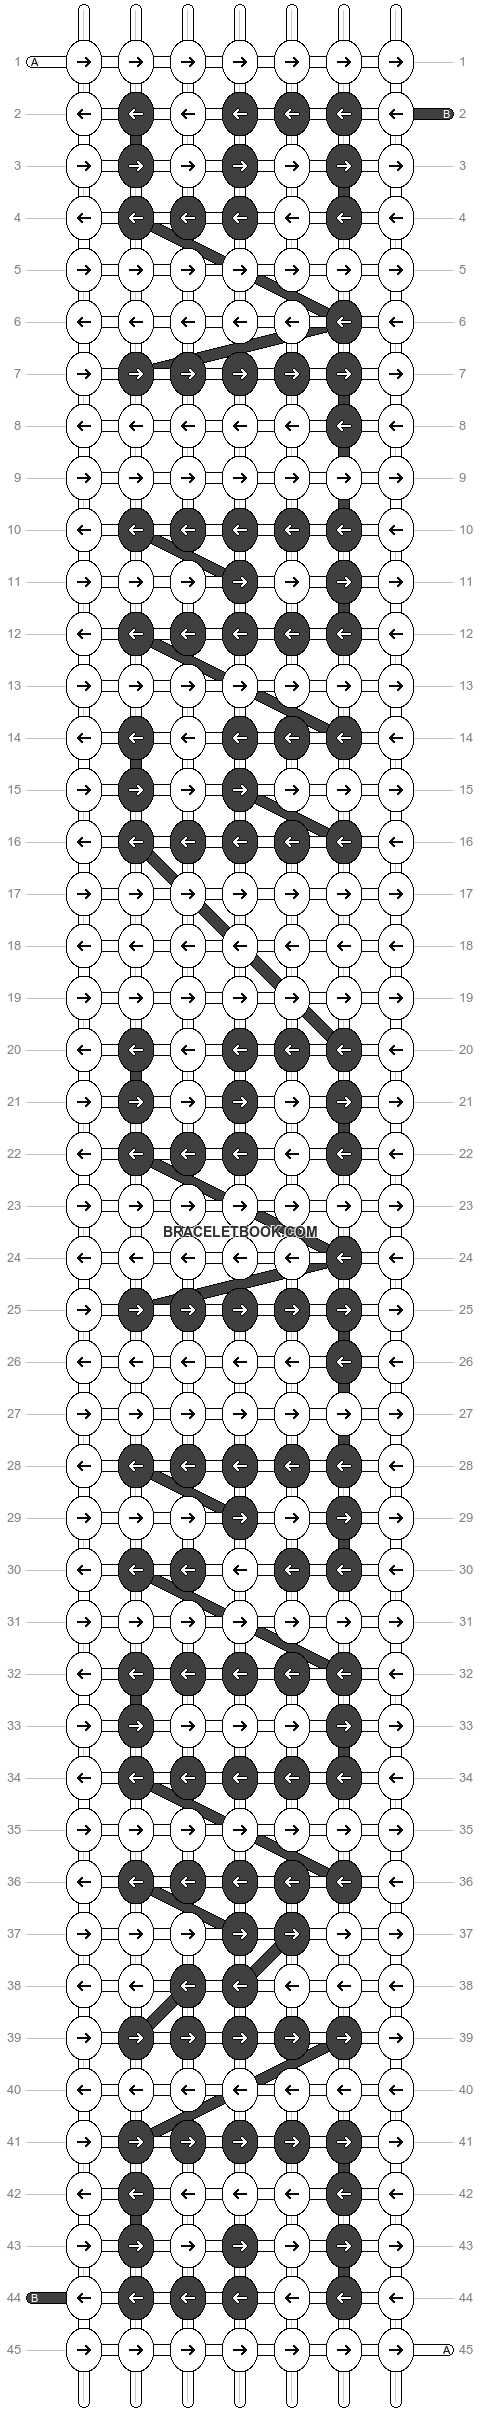 Alpha pattern #3665 pattern